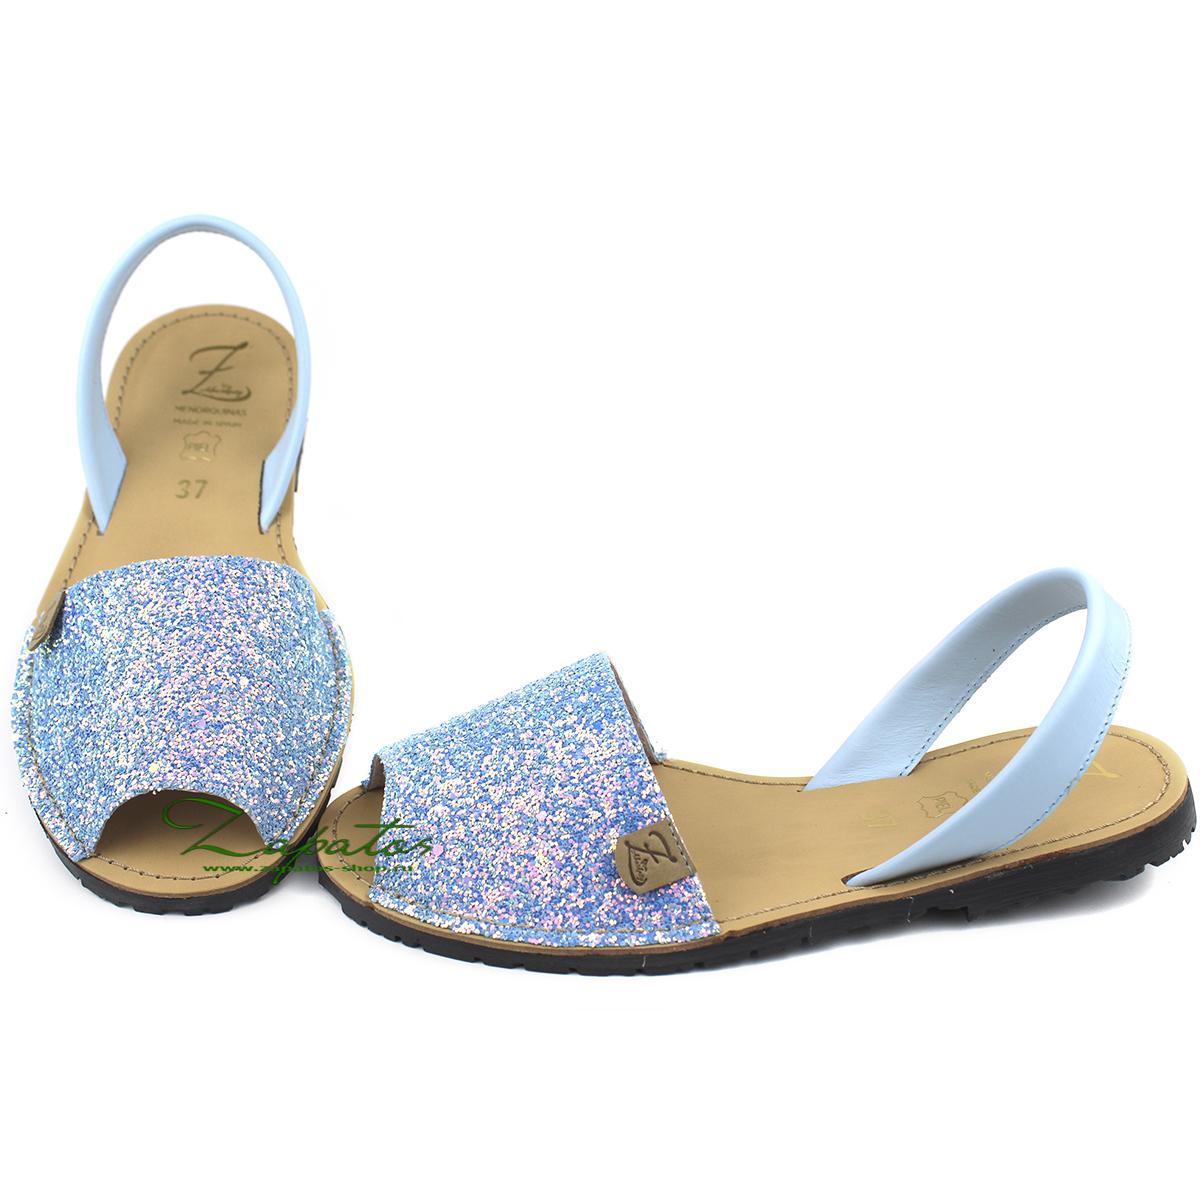 Абаркасы AB. Zapatos 320-5  CELESTE